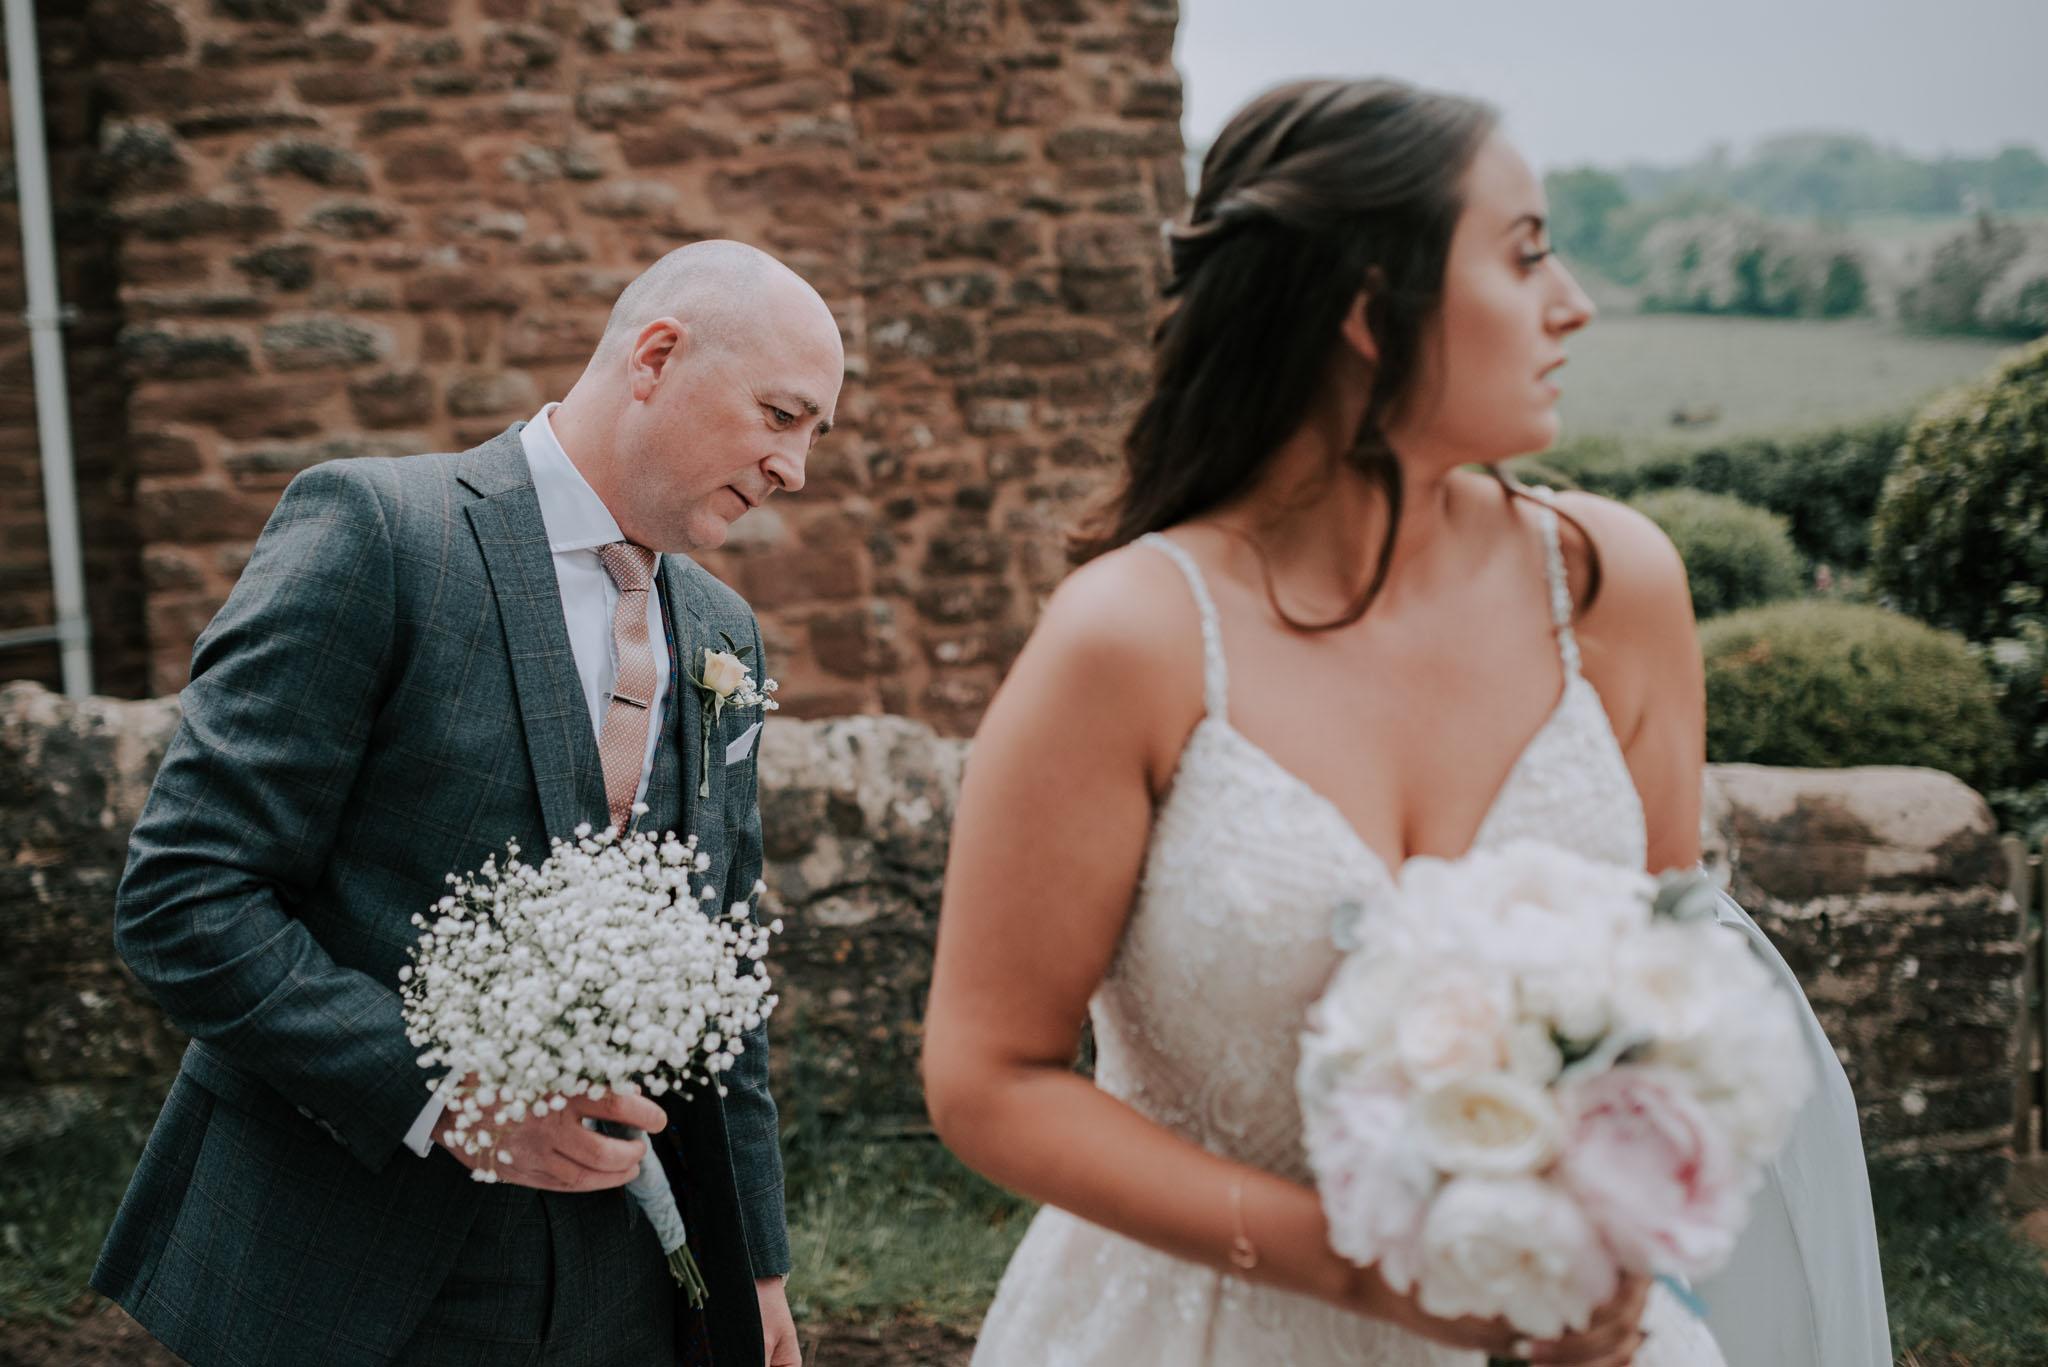 wedding-photographer-glewstone-court-hereford-scott-stockwell-photography135.jpg